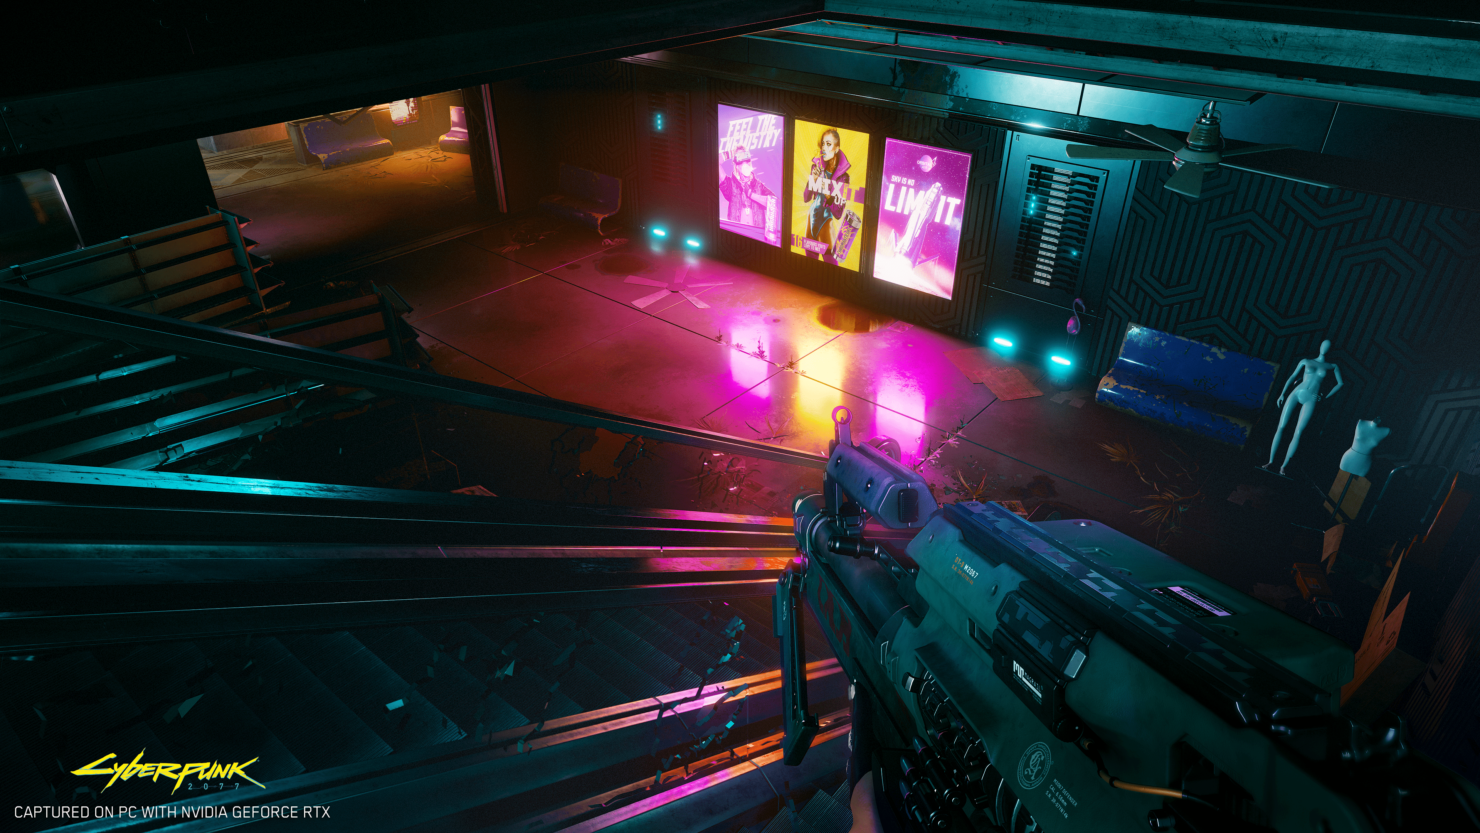 Cyberpunk 2077 Xbox One X 4K Resolution cyberpunk 2077 rtx ray tracing 4k 2-min